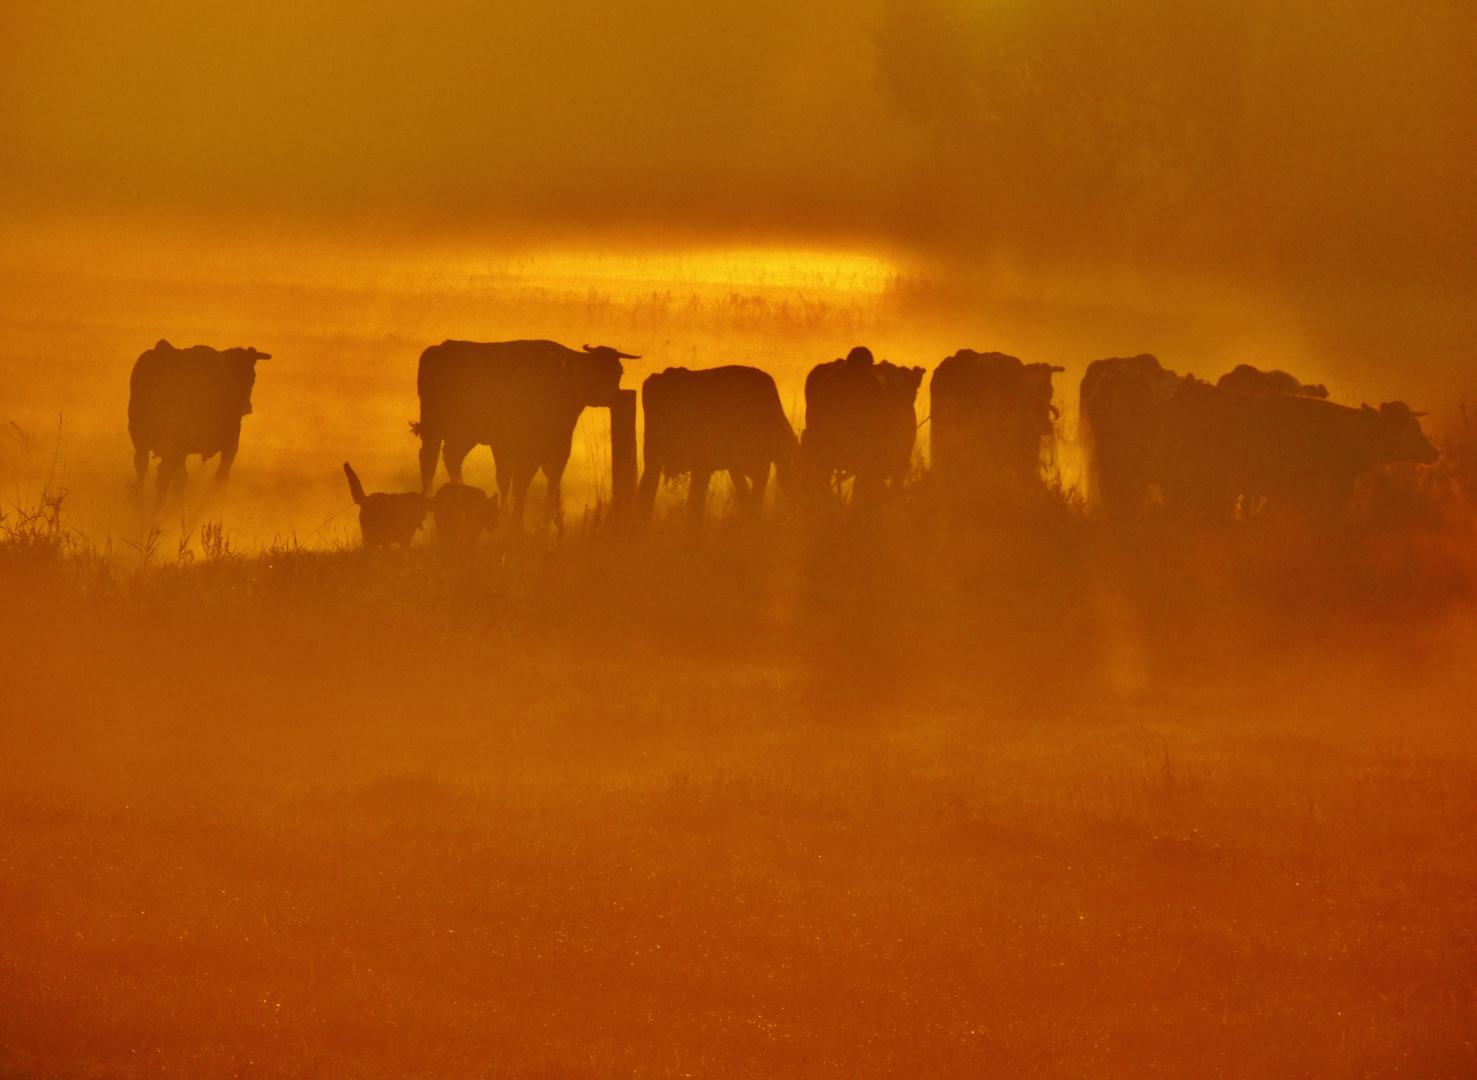 Cows at dawn III